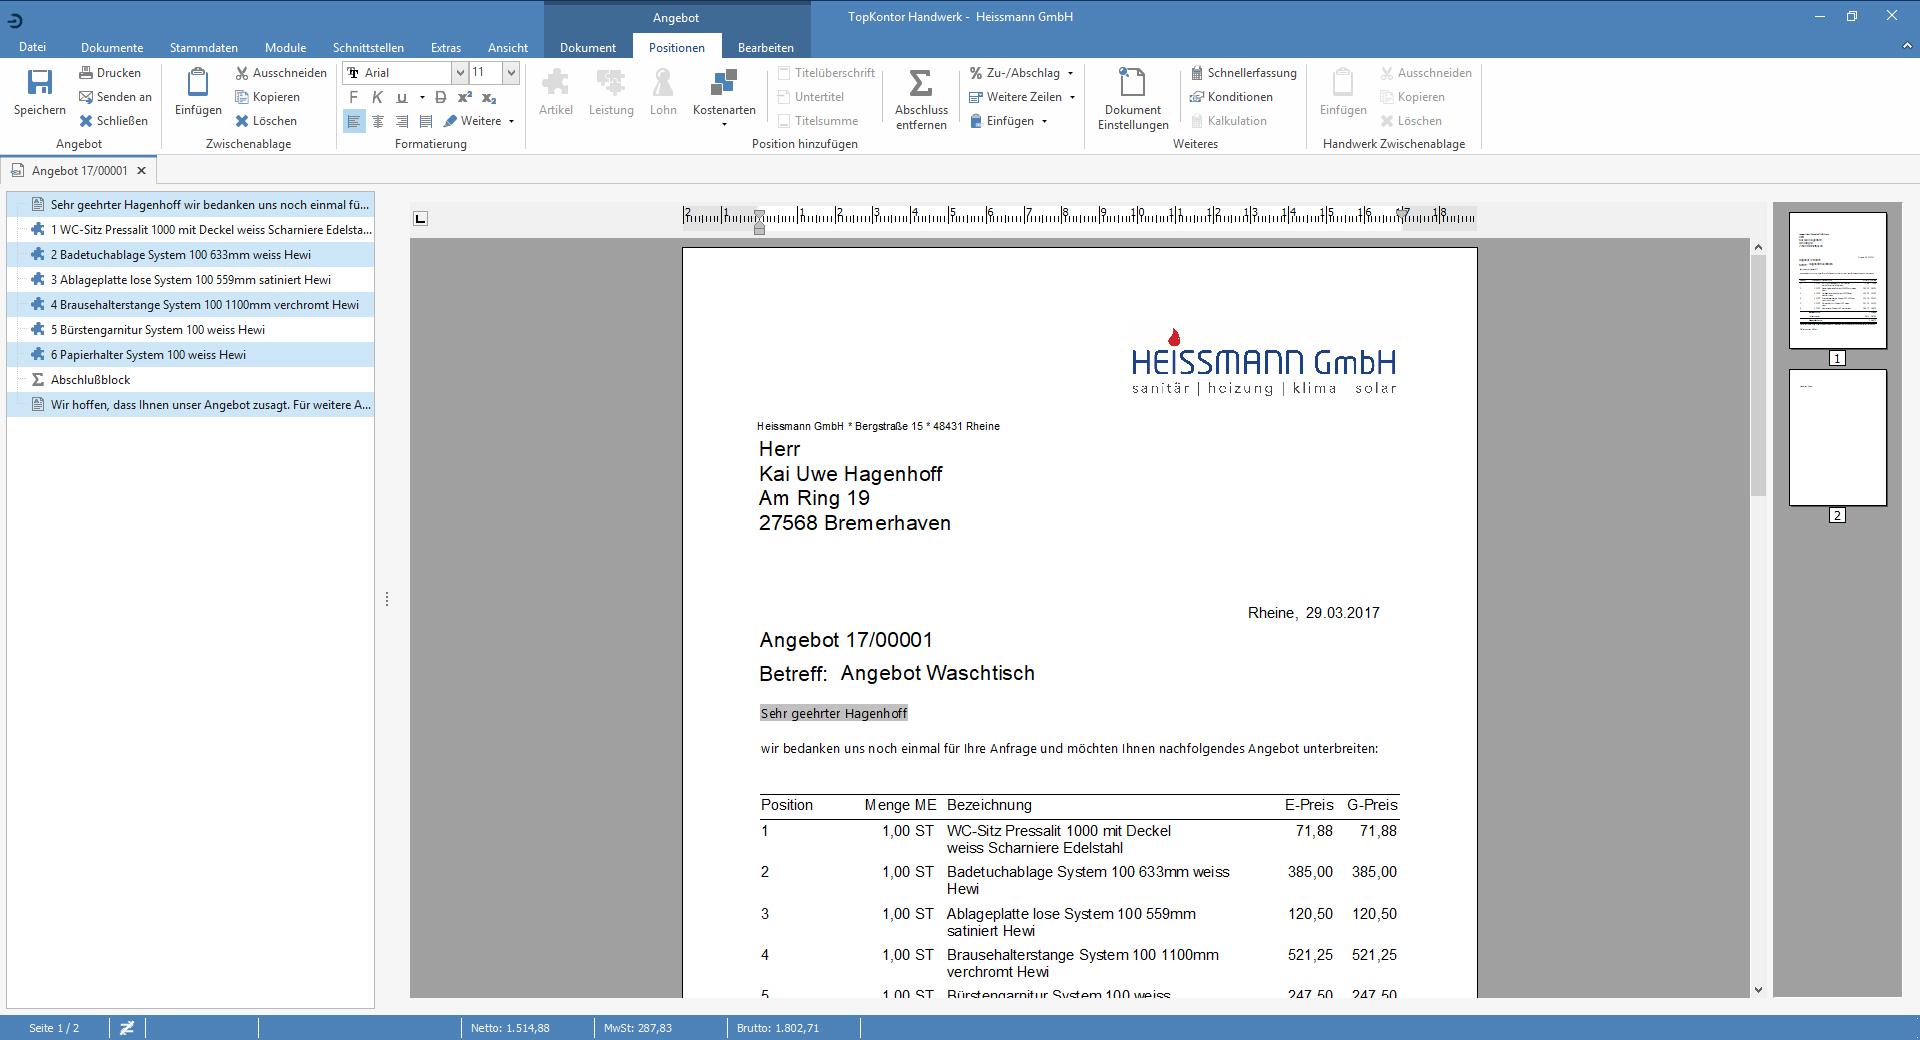 TopKontor Handwerk V6 - Angebot